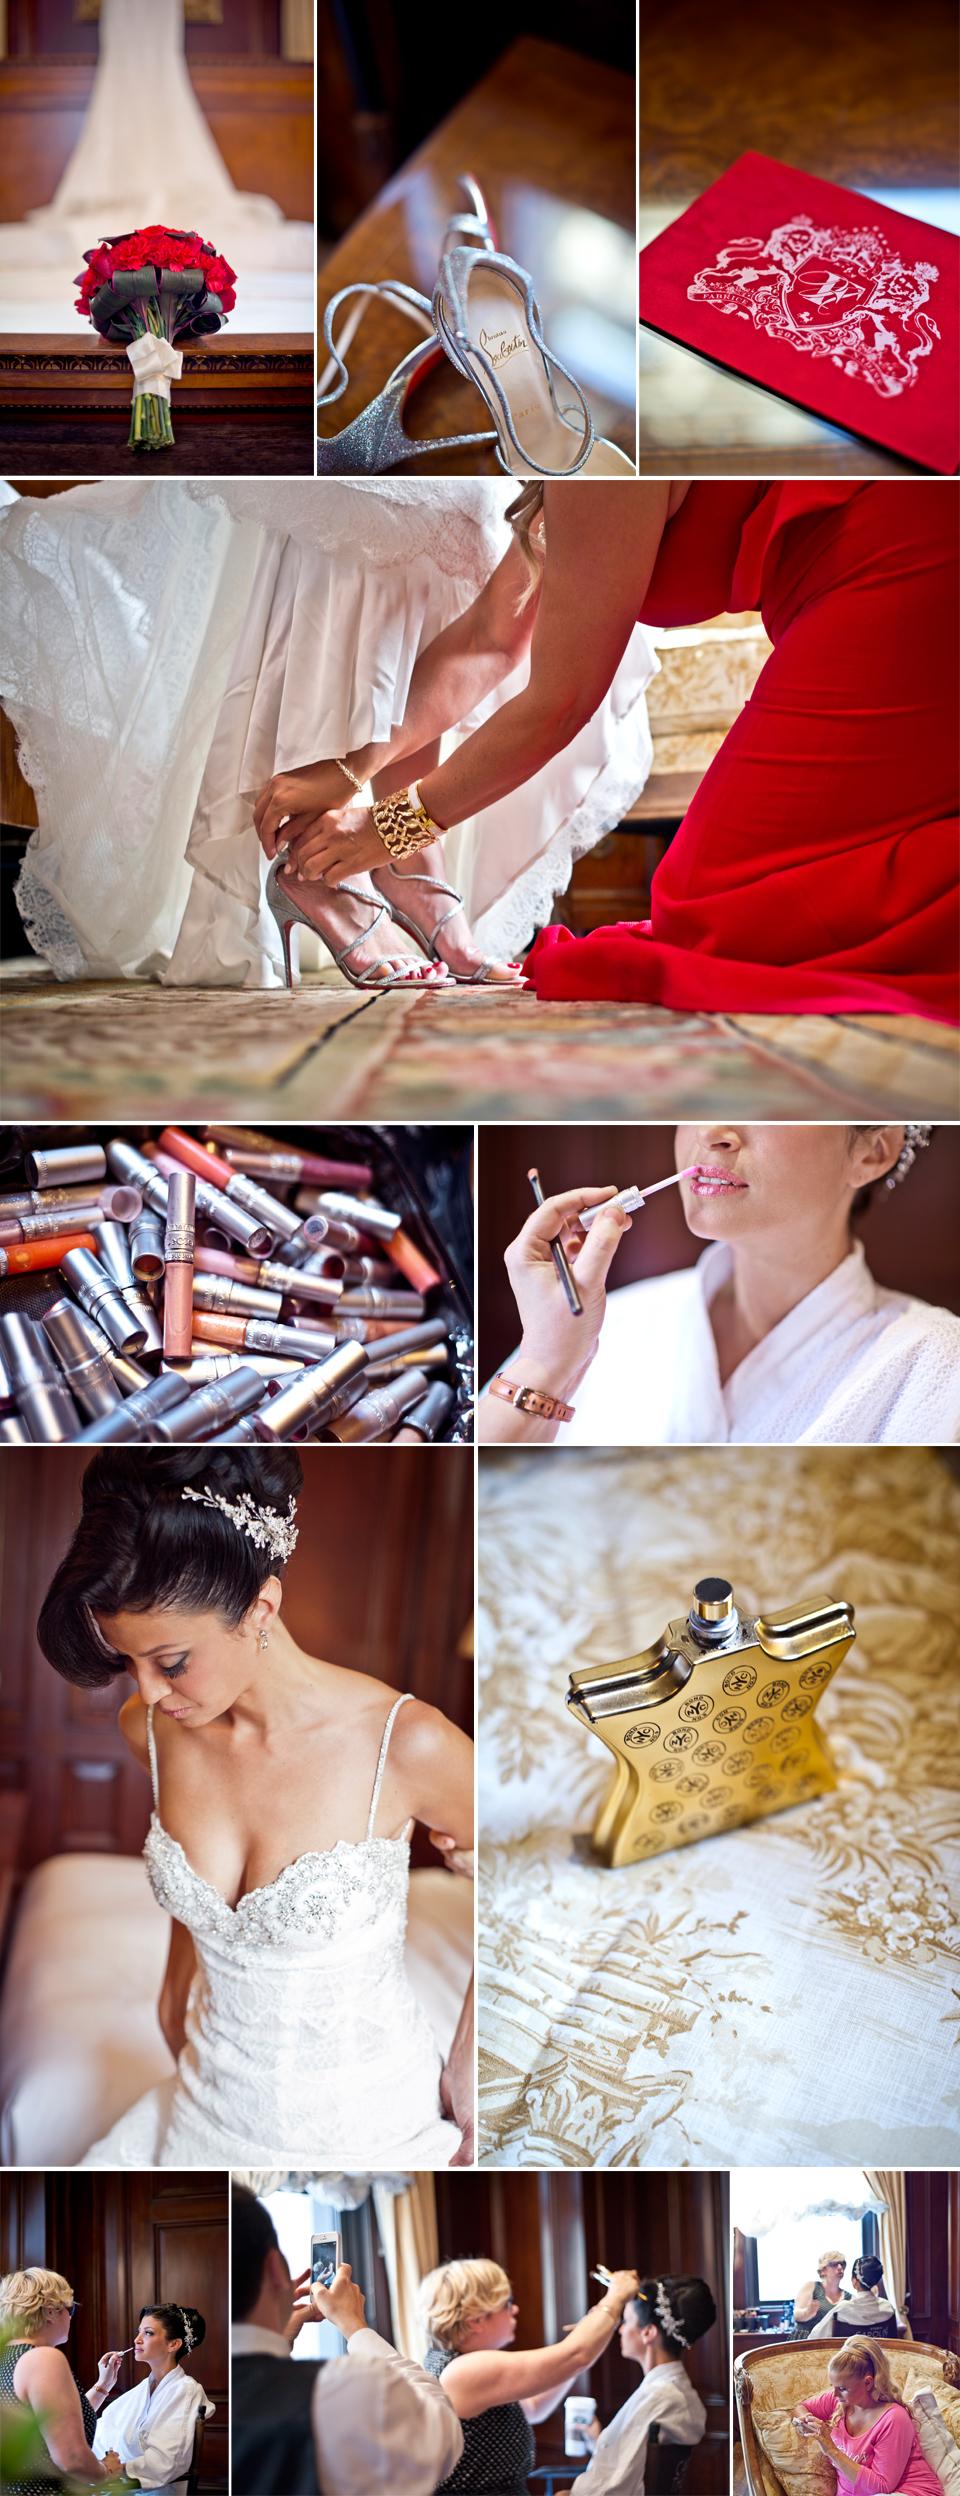 Montreal Wedding Photography | Bridal Details | Hotel Le St-James | Science Center | Old Port | LindsayMuciyPhotography